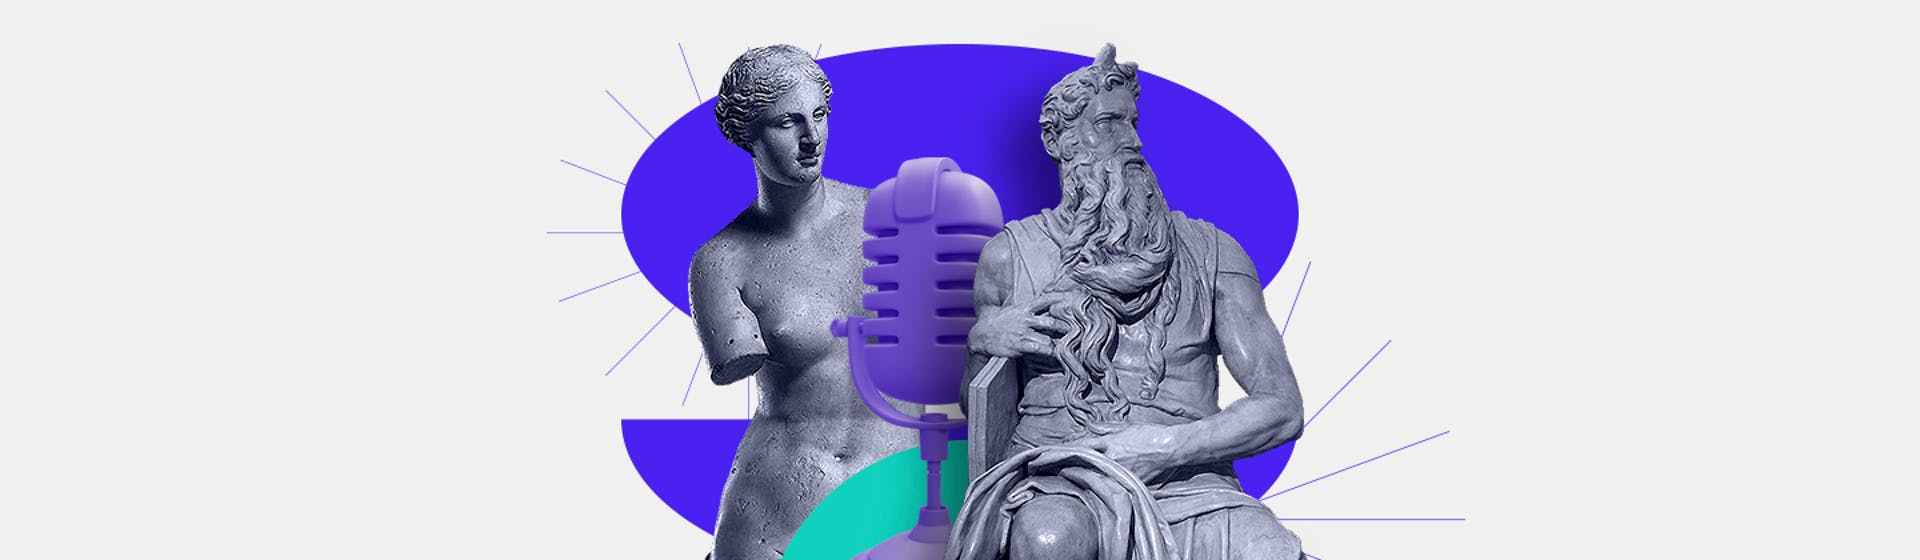 Top 10 podcast de historia: Adéntrate en relatos históricos increíbles narrados por expertos